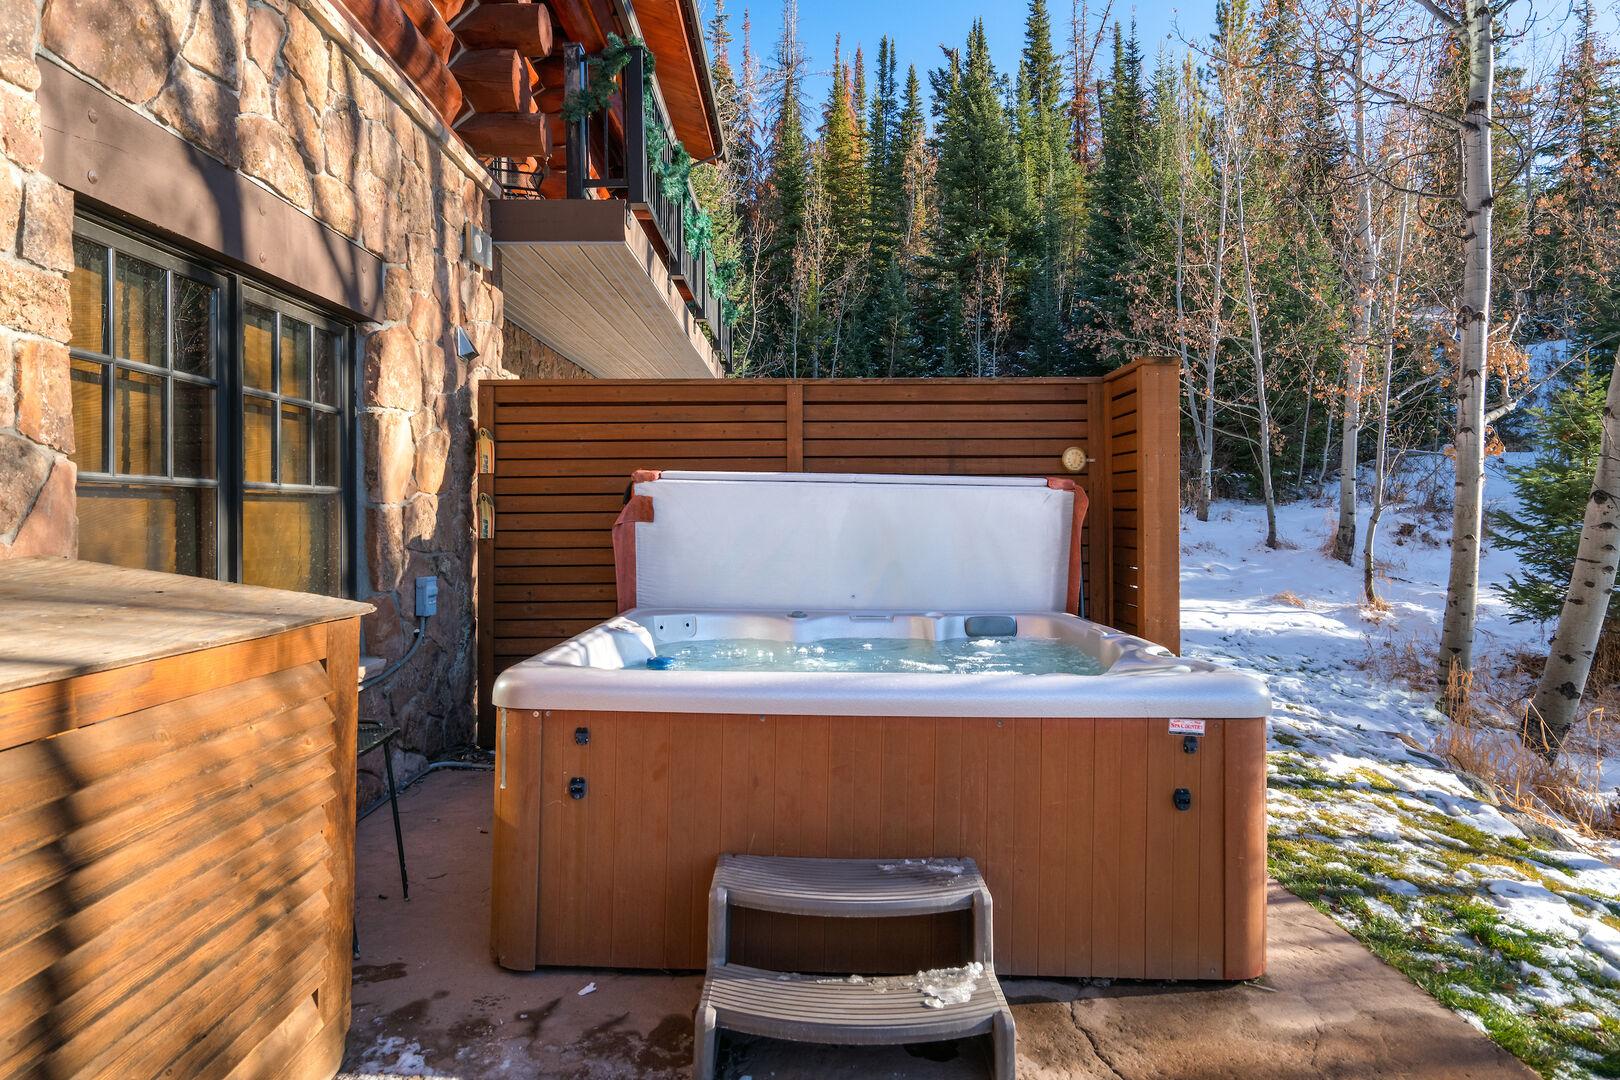 6 person hot tub!